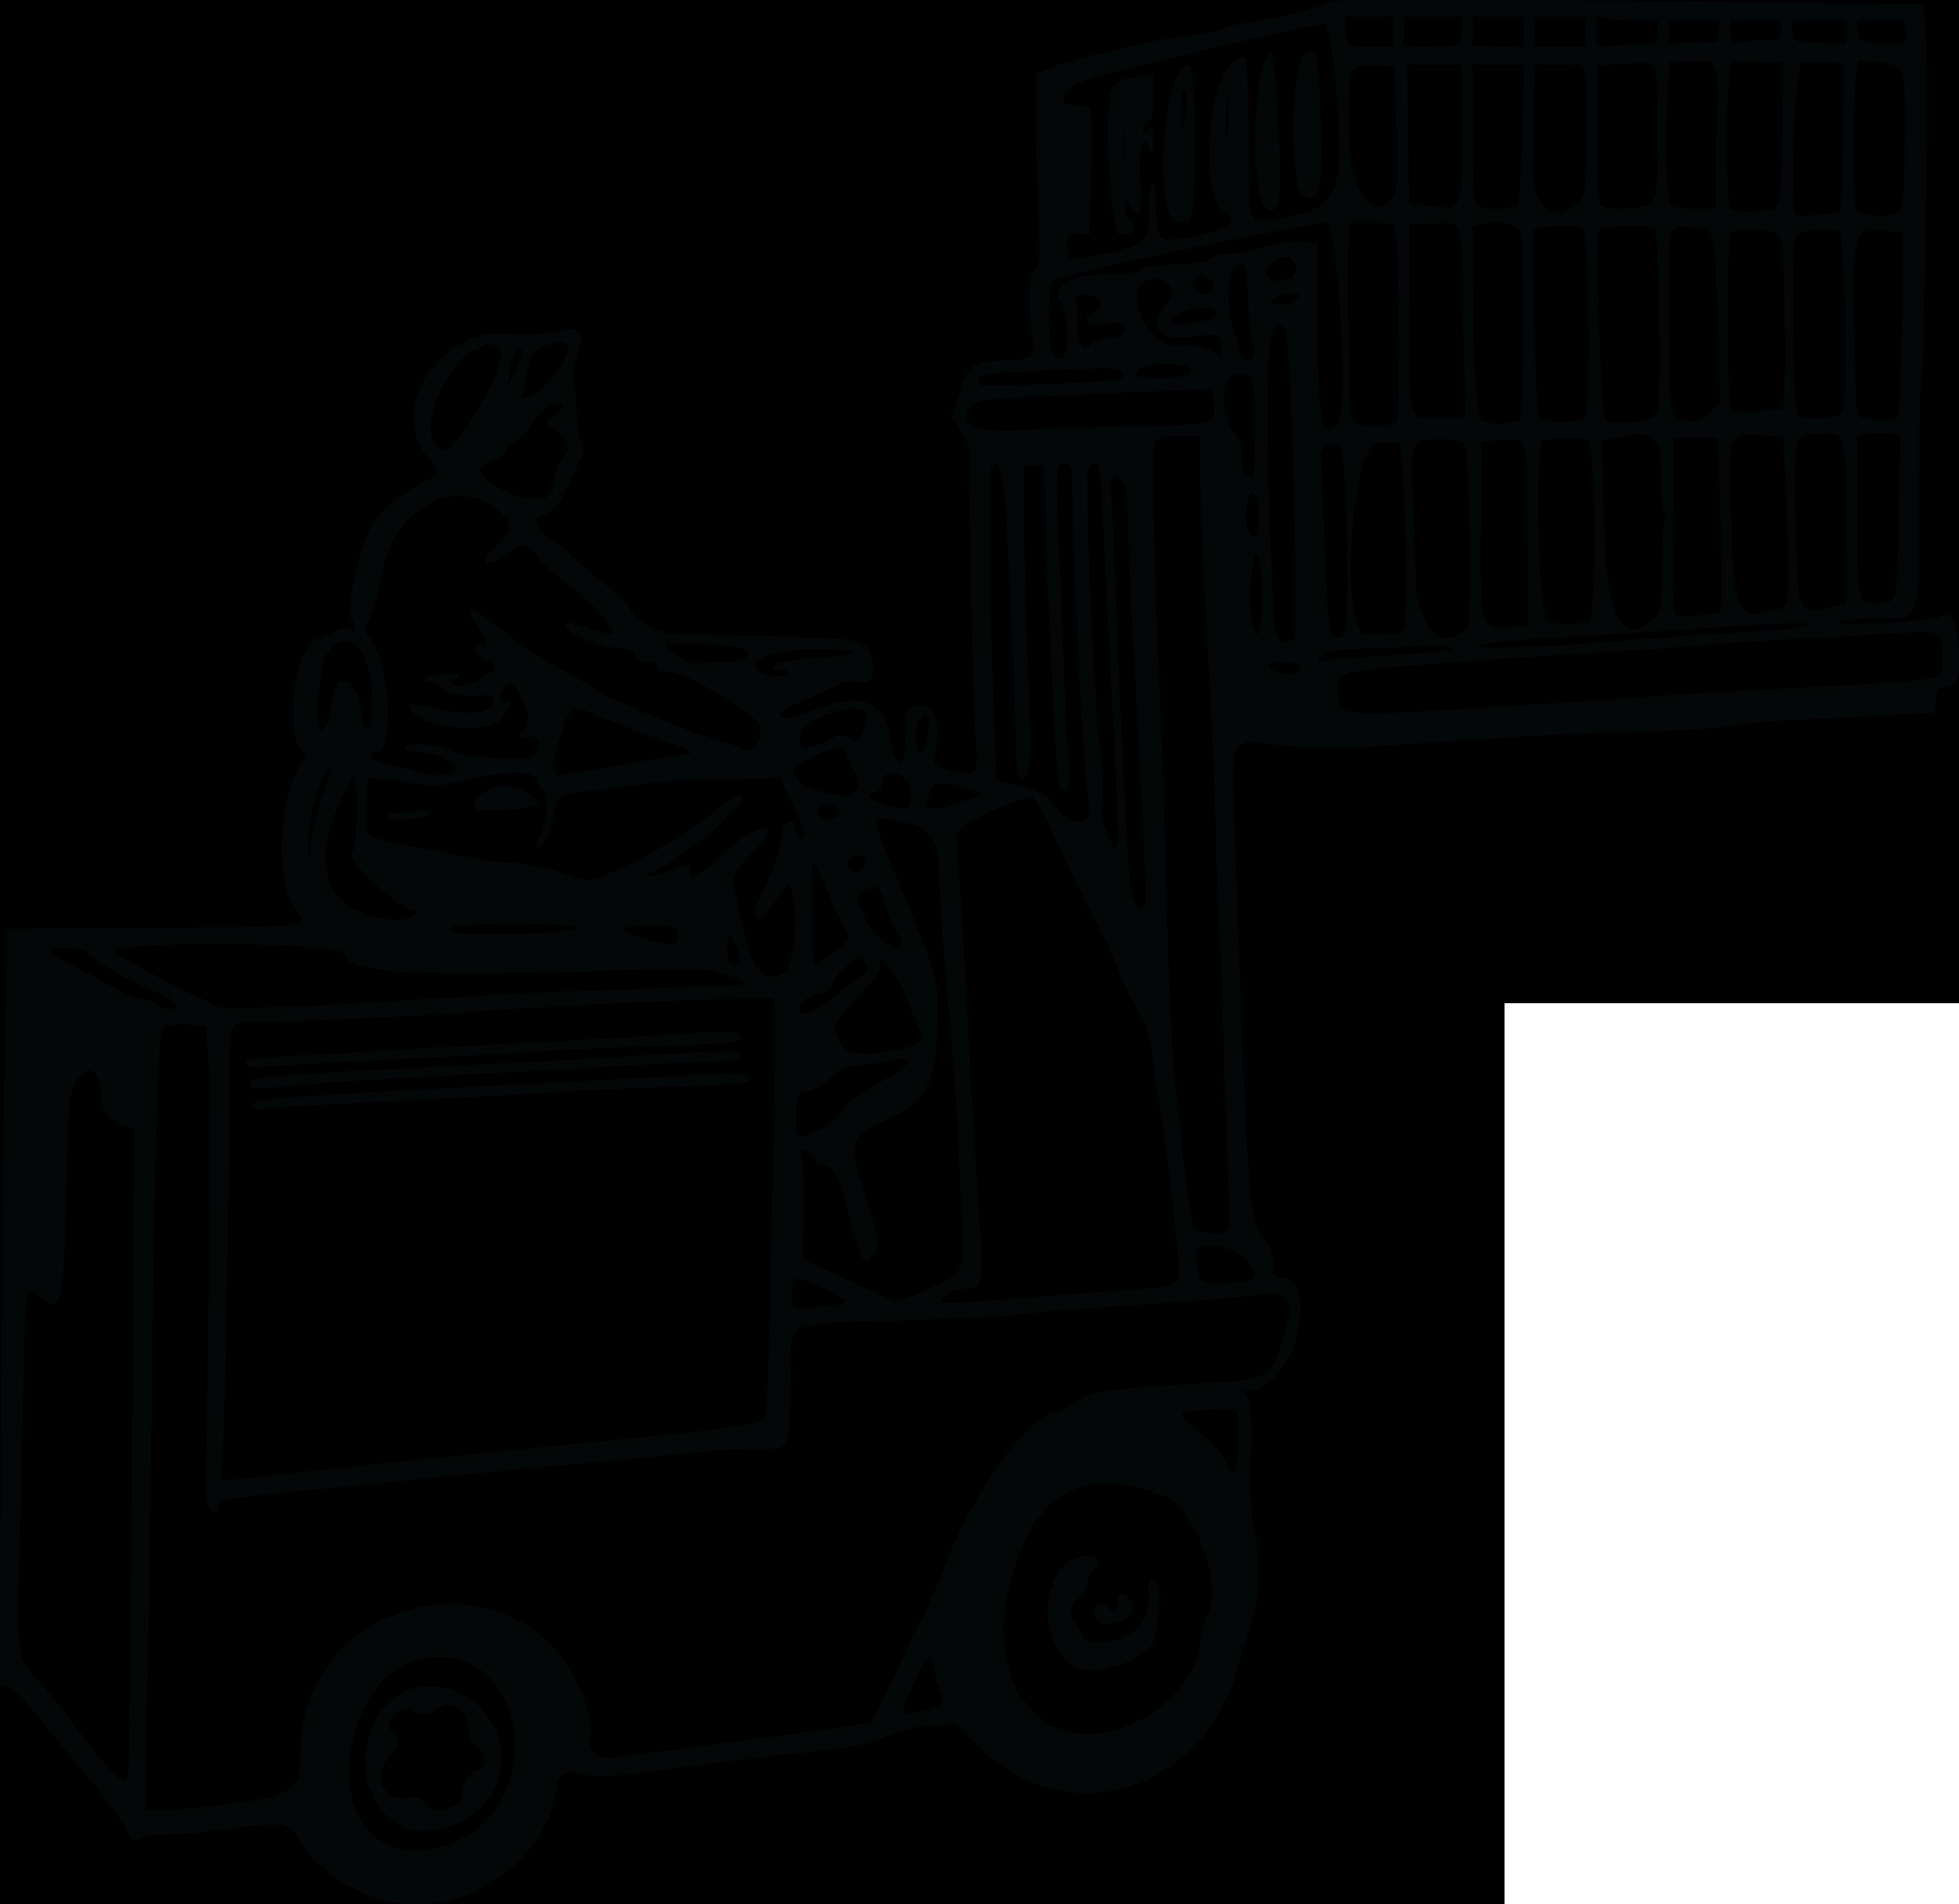 4000x3887 Forklift Outline Png Clipart